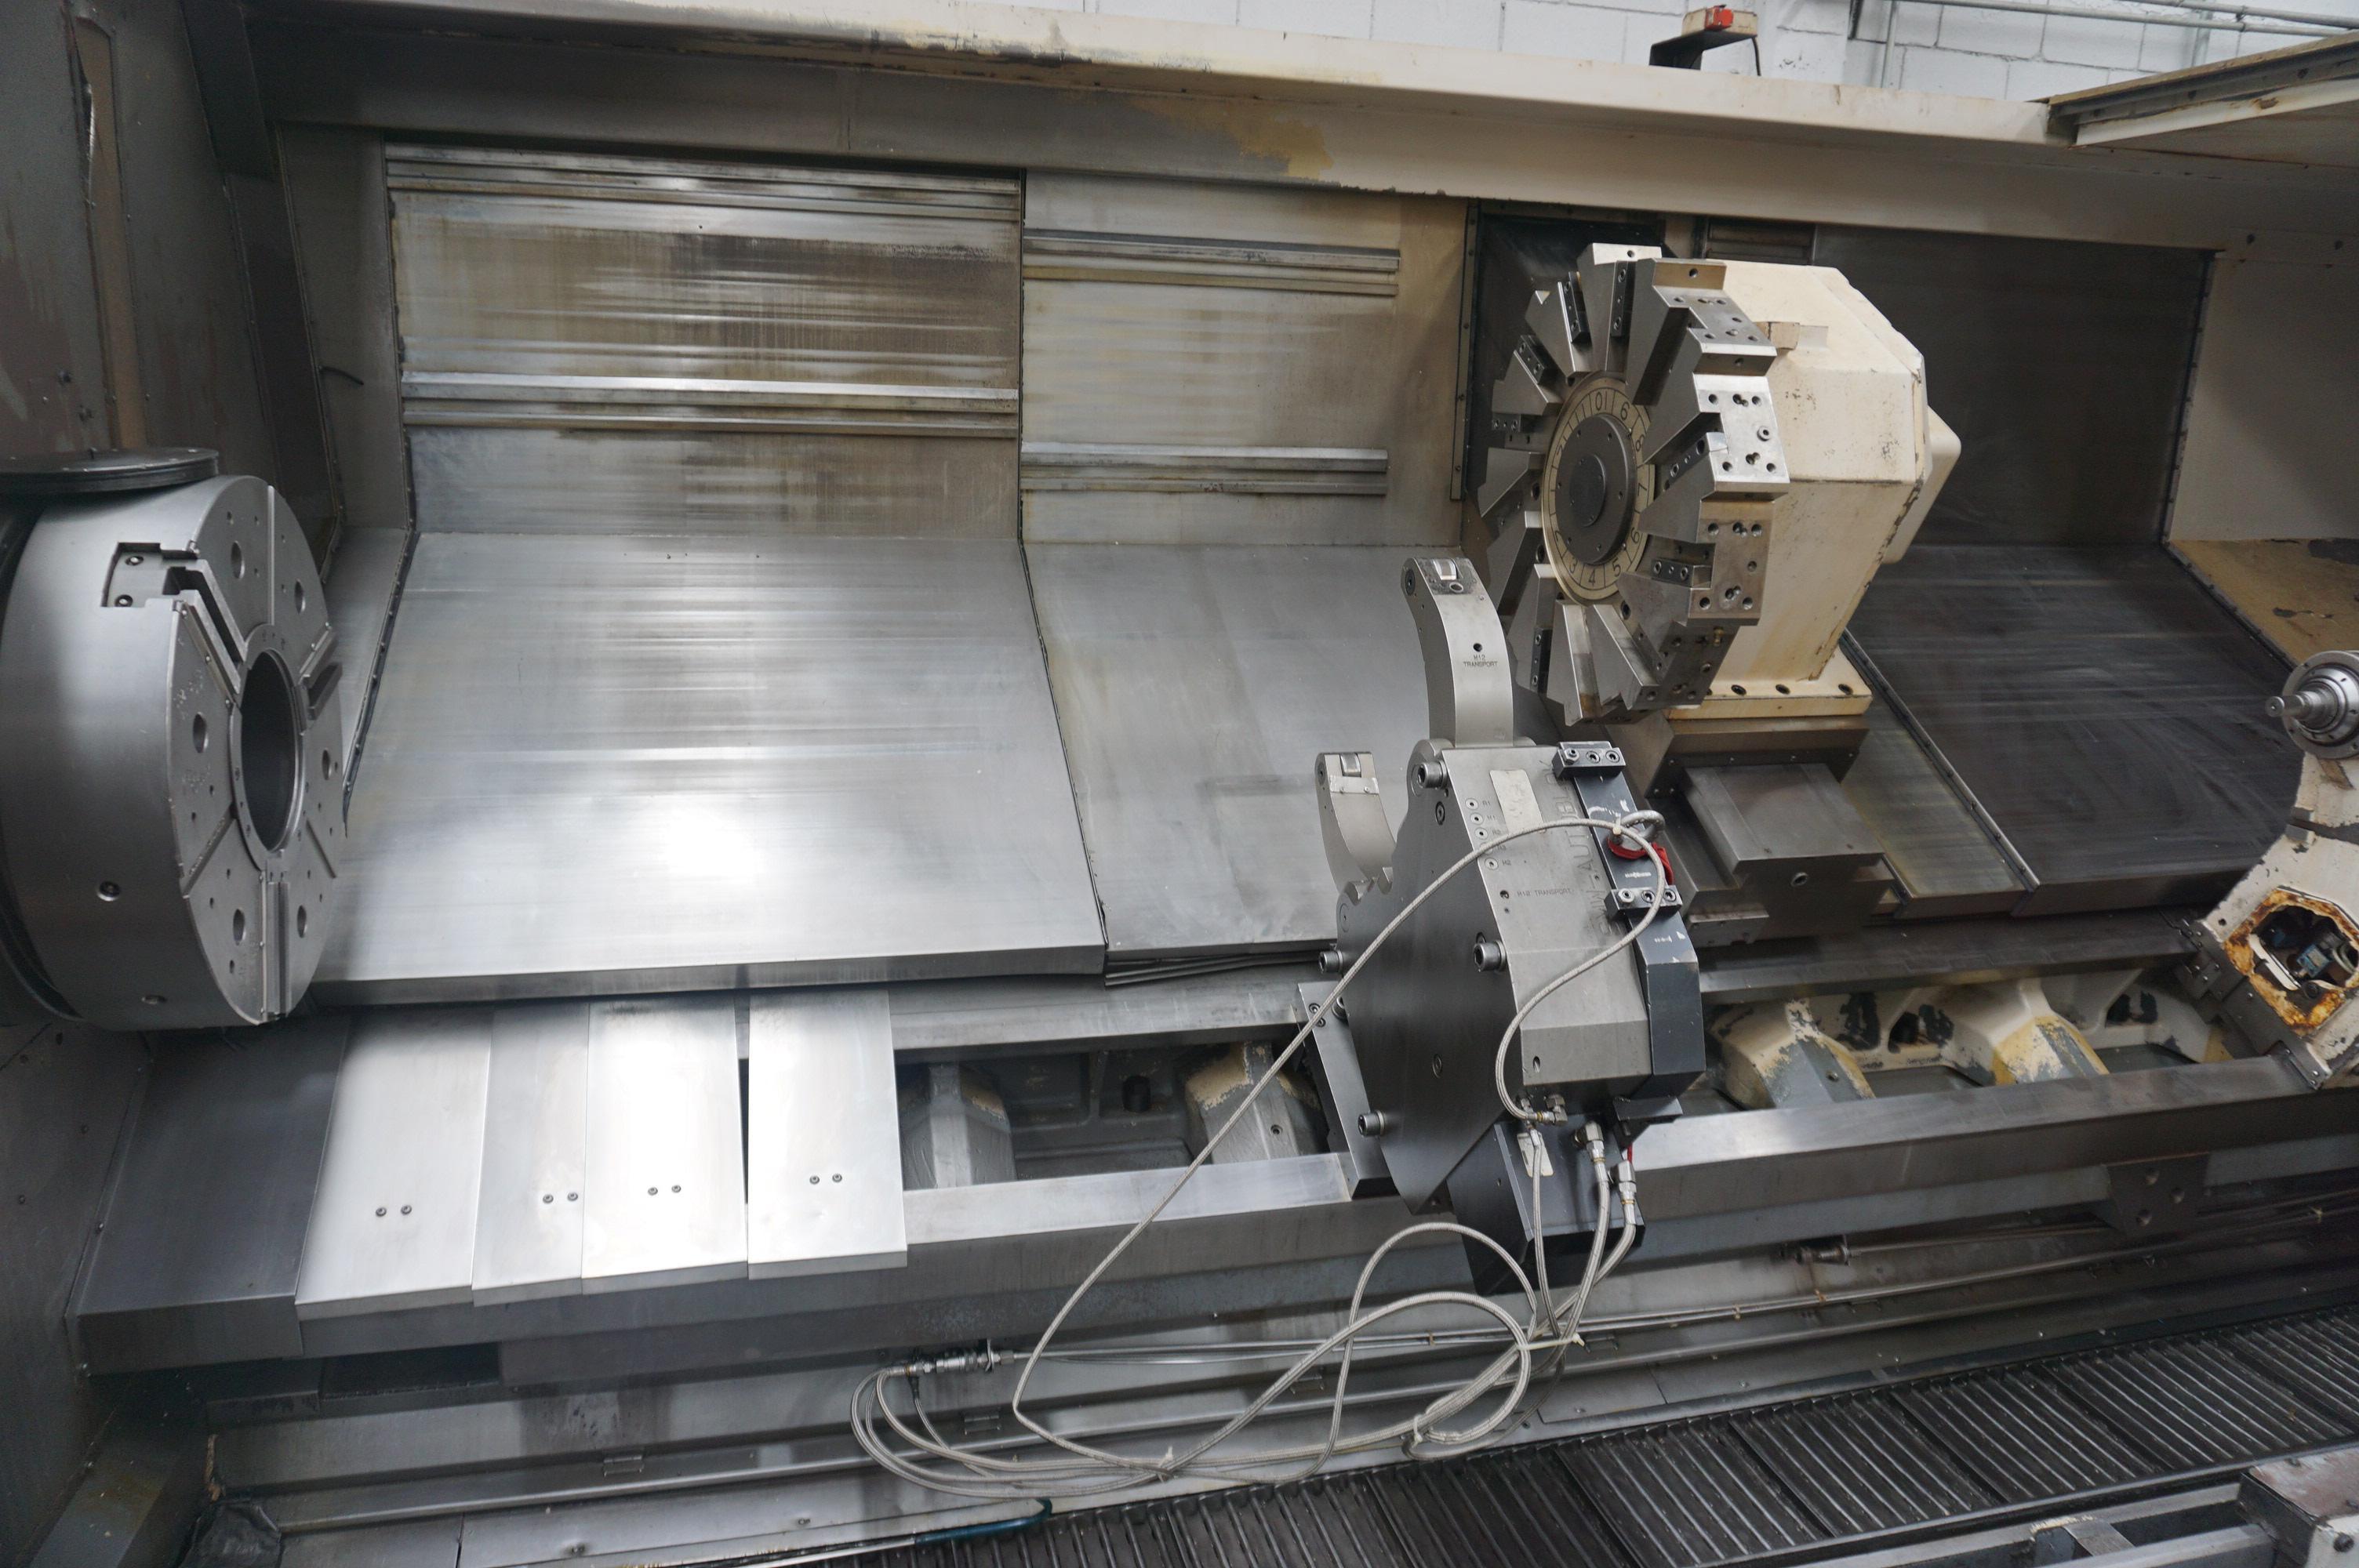 2006 Okuma LB45II/3000 - CNC Horizontal Lathe